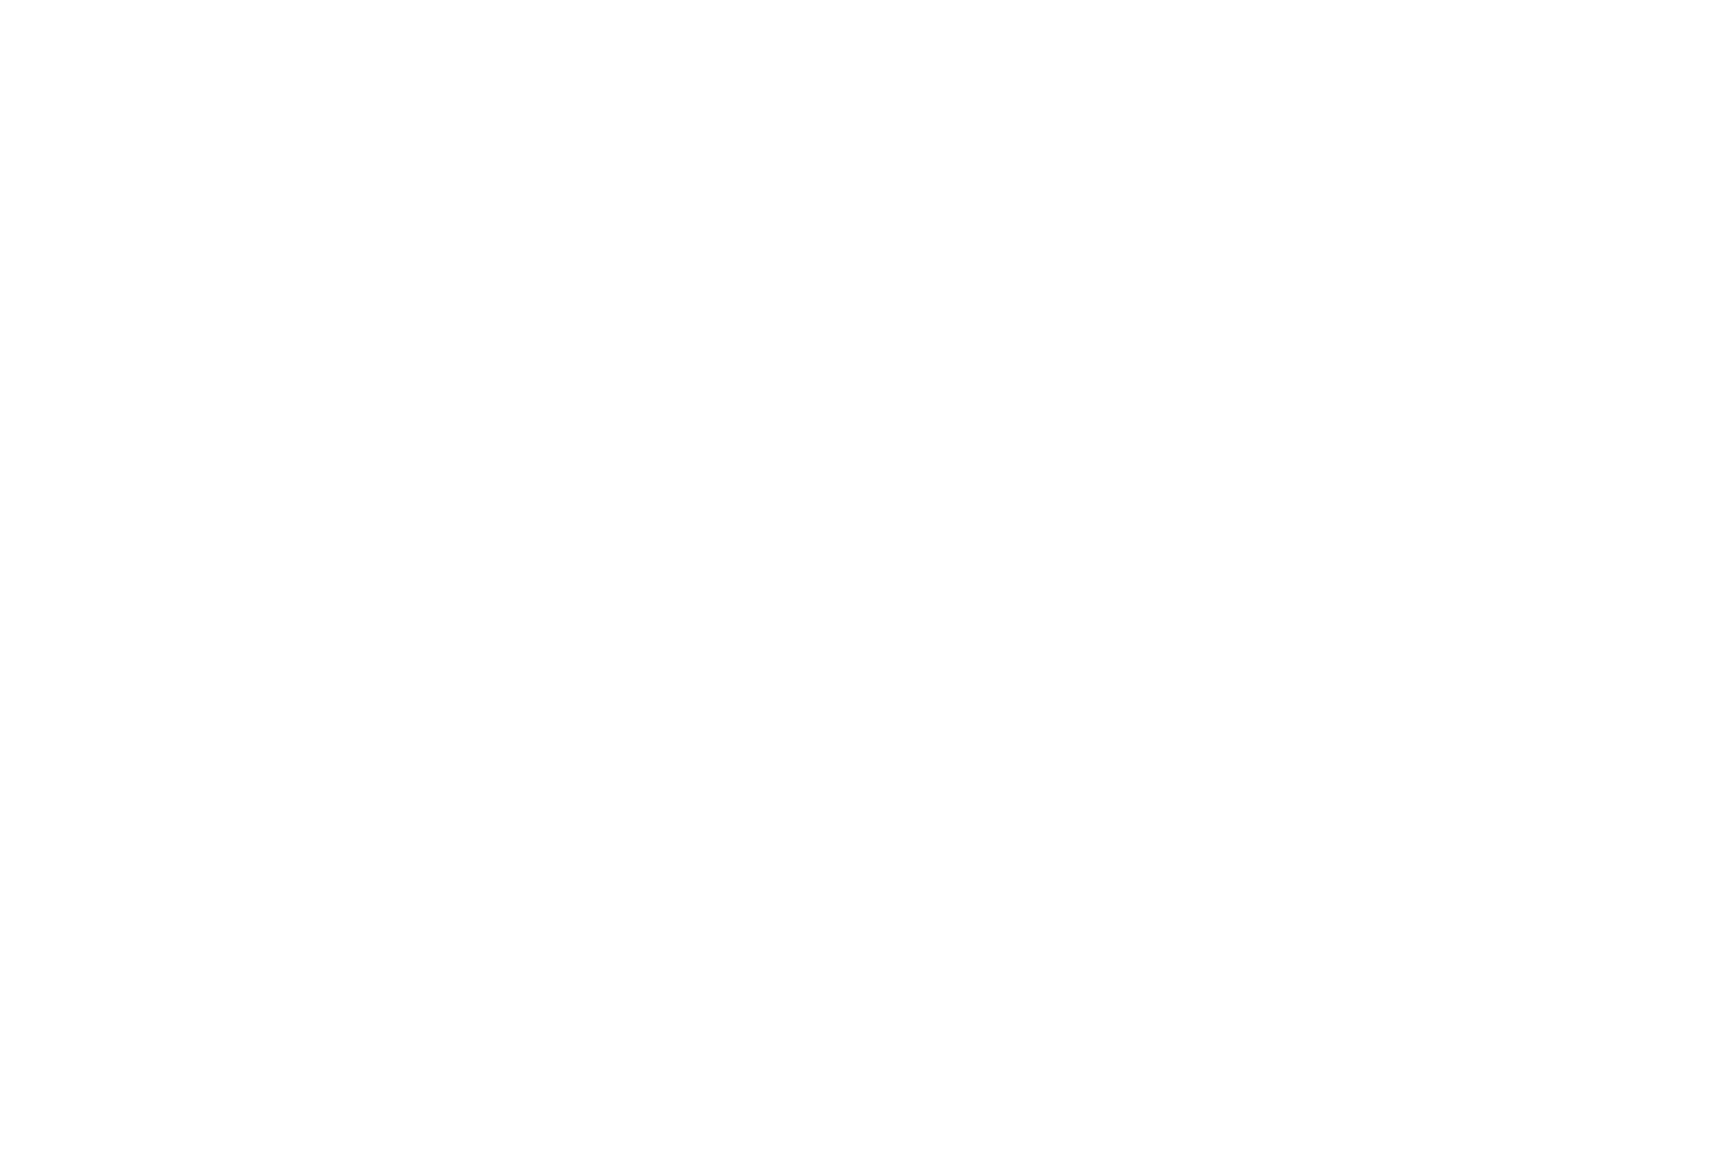 FINALIST - New York City International Screenplay Awards - 2019_Black